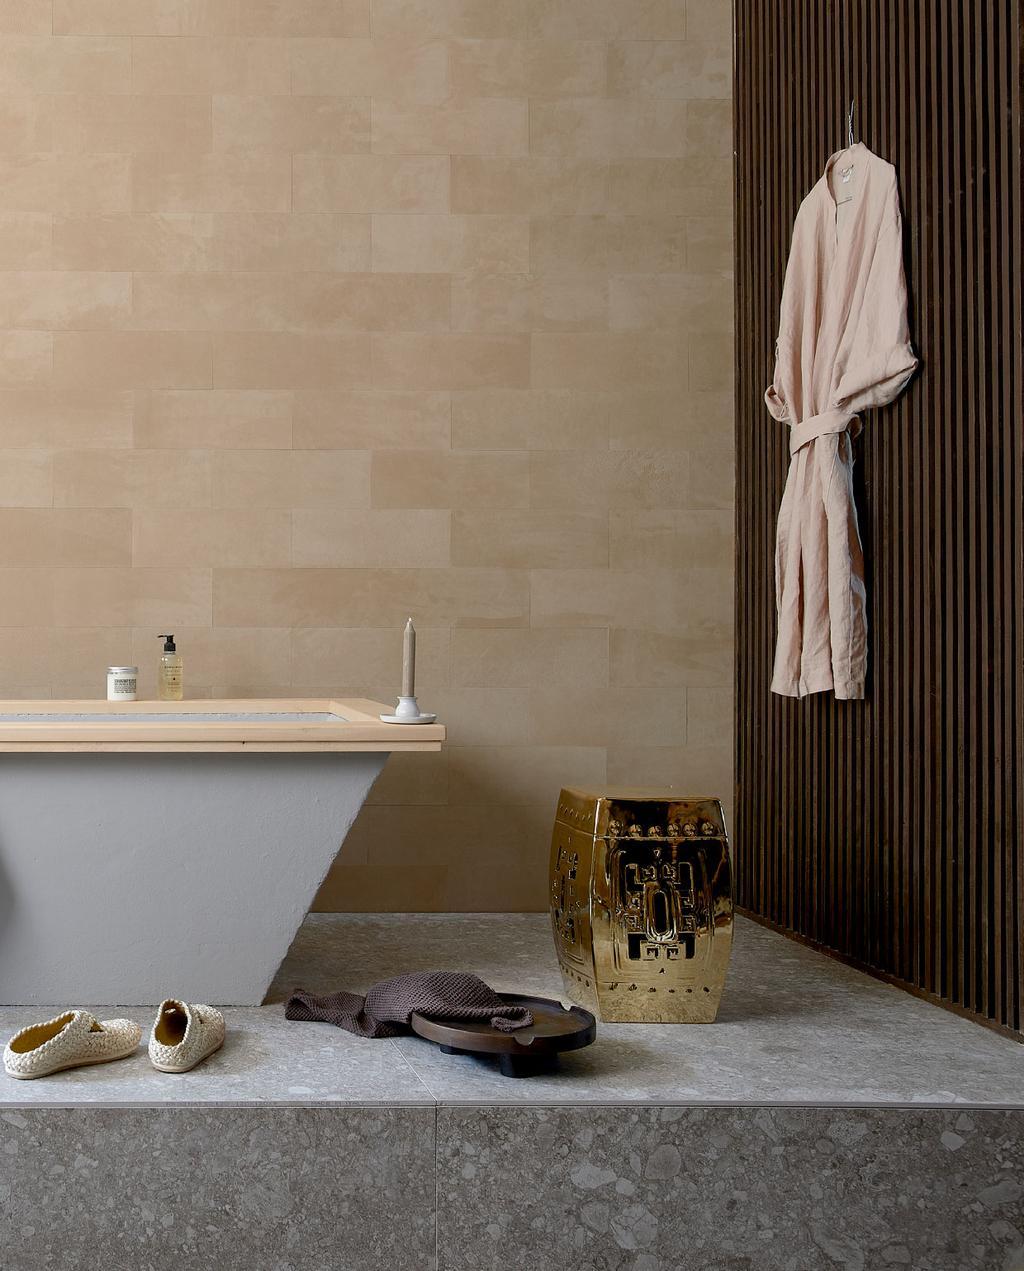 vtwonen 10-2020 | trendhuis fietje japandi badkamer leertegels betonnen bad